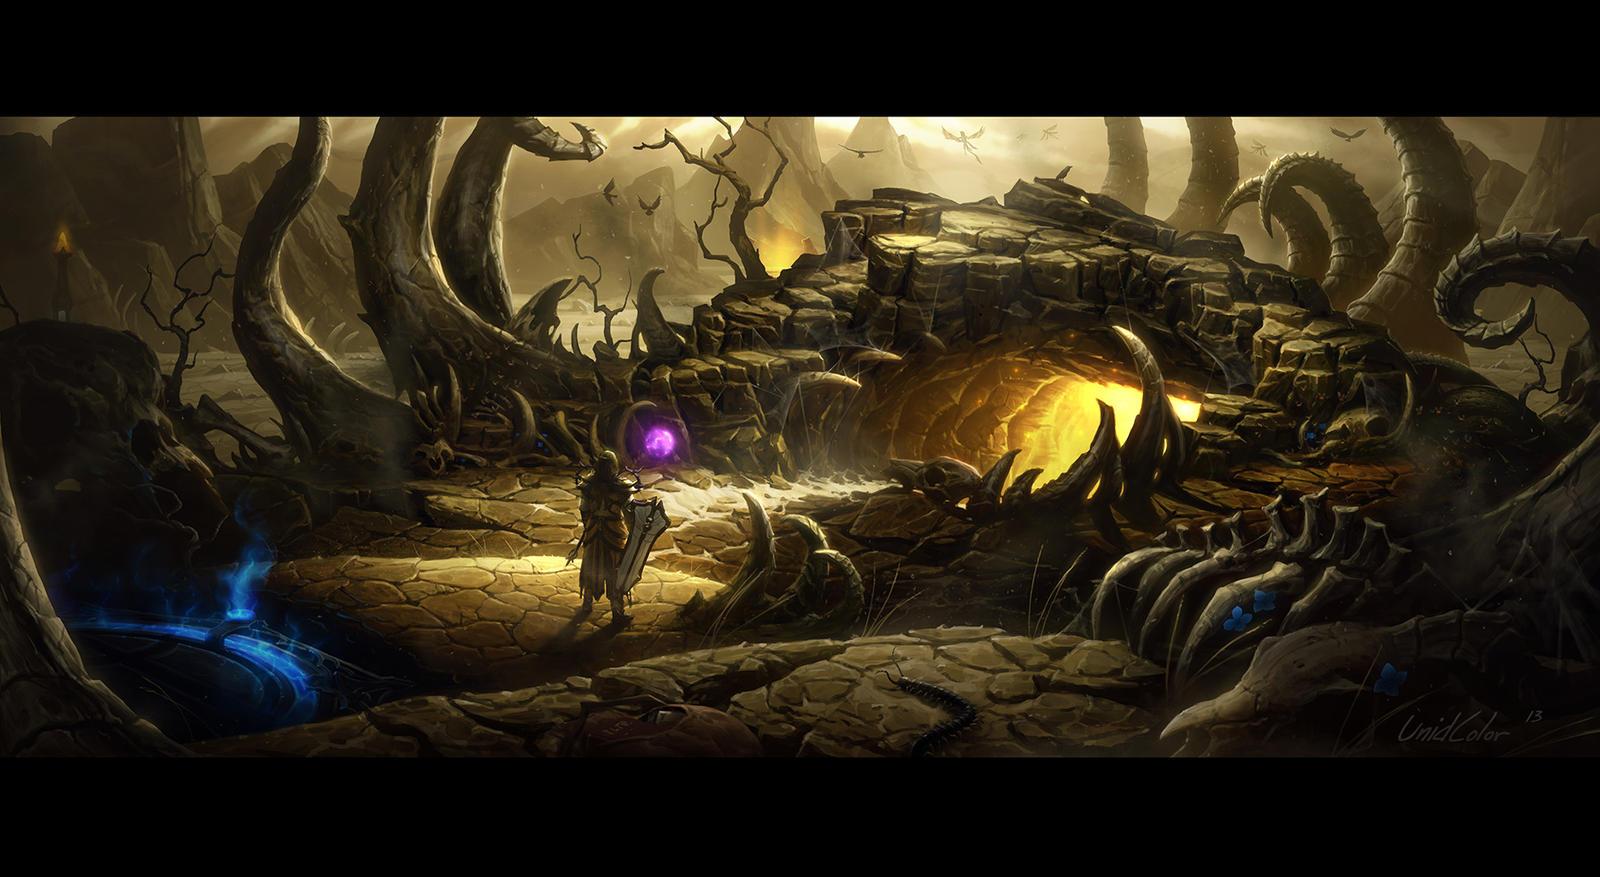 Diablo III Desolate Sands - Cave of the Betrayer